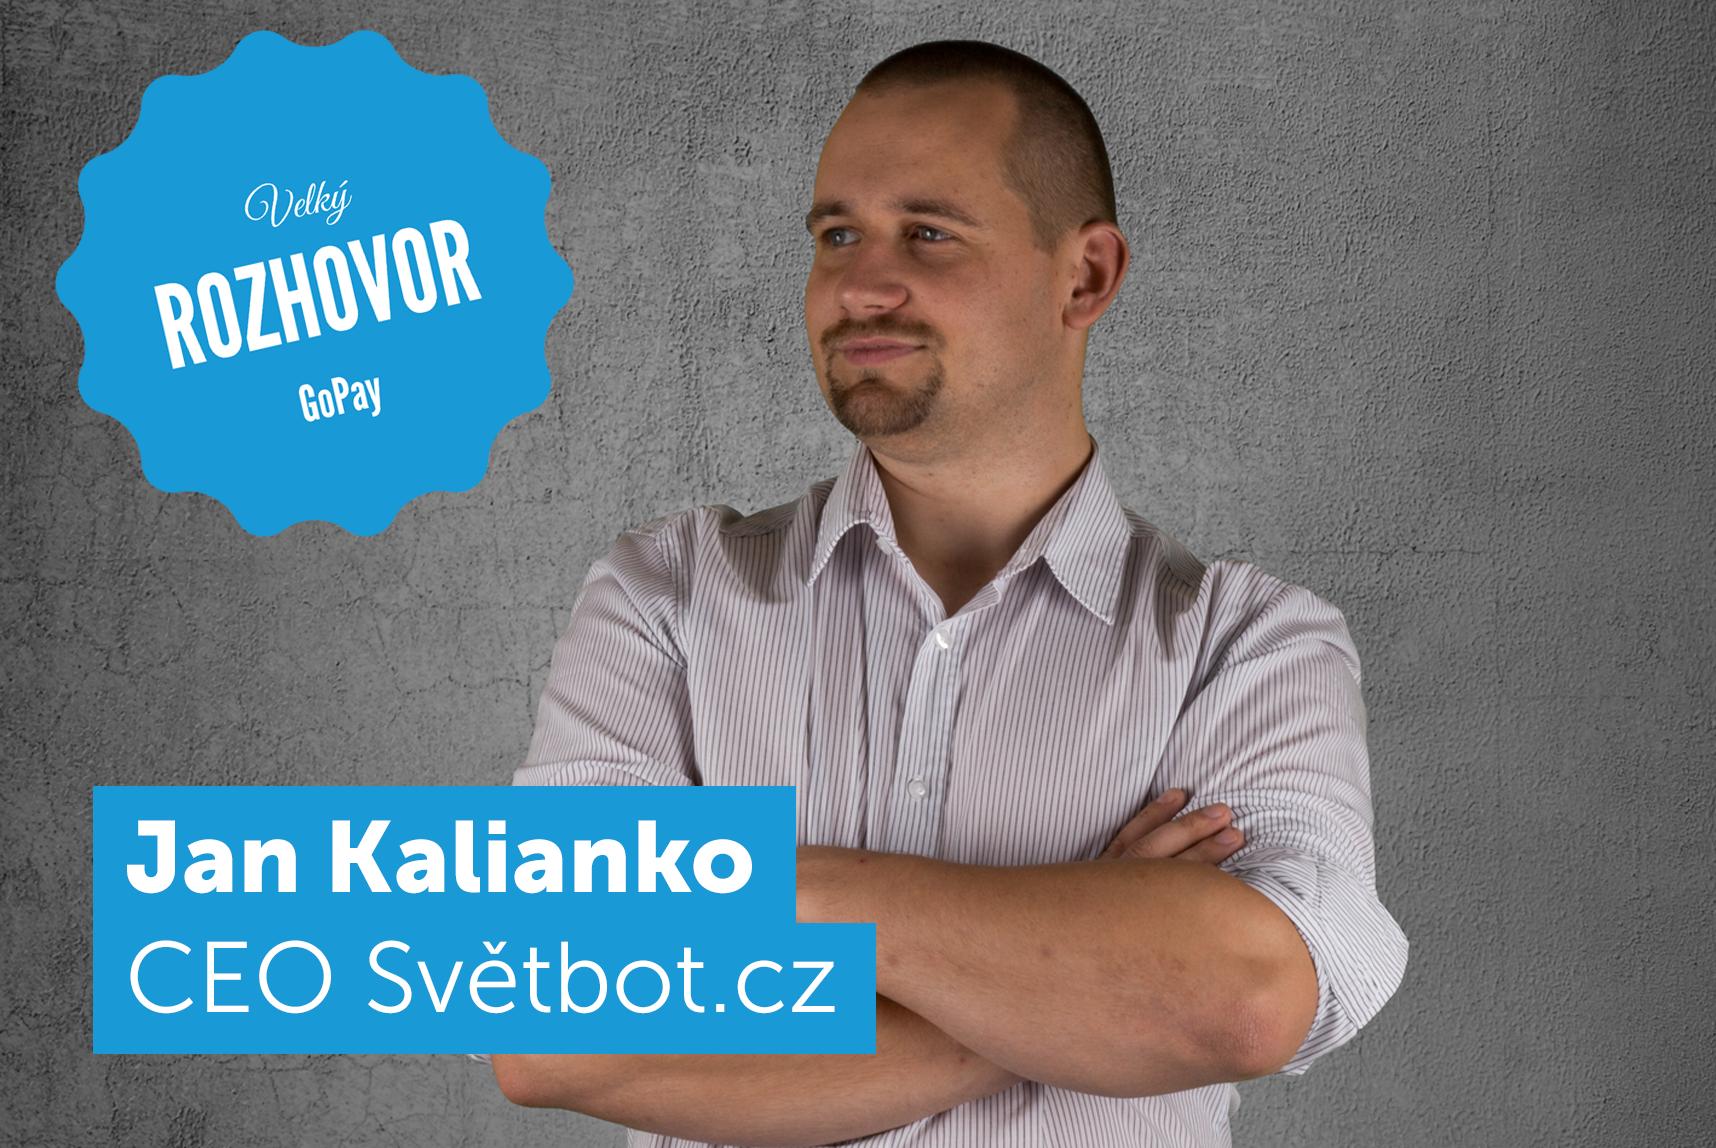 Jan Kalianko rozhovor